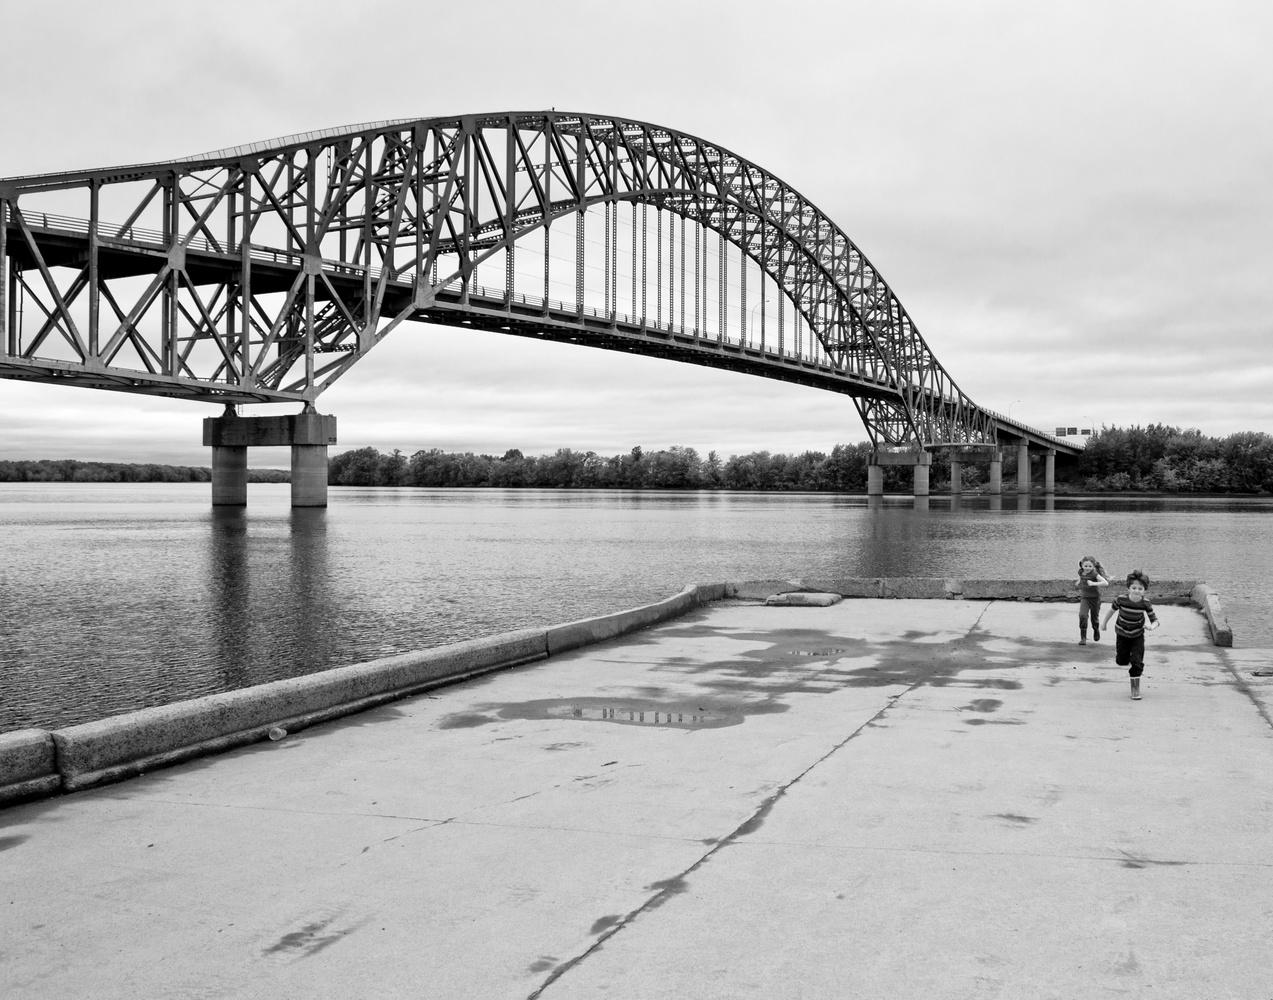 The Burton Bridge Over St John River by James Jewers